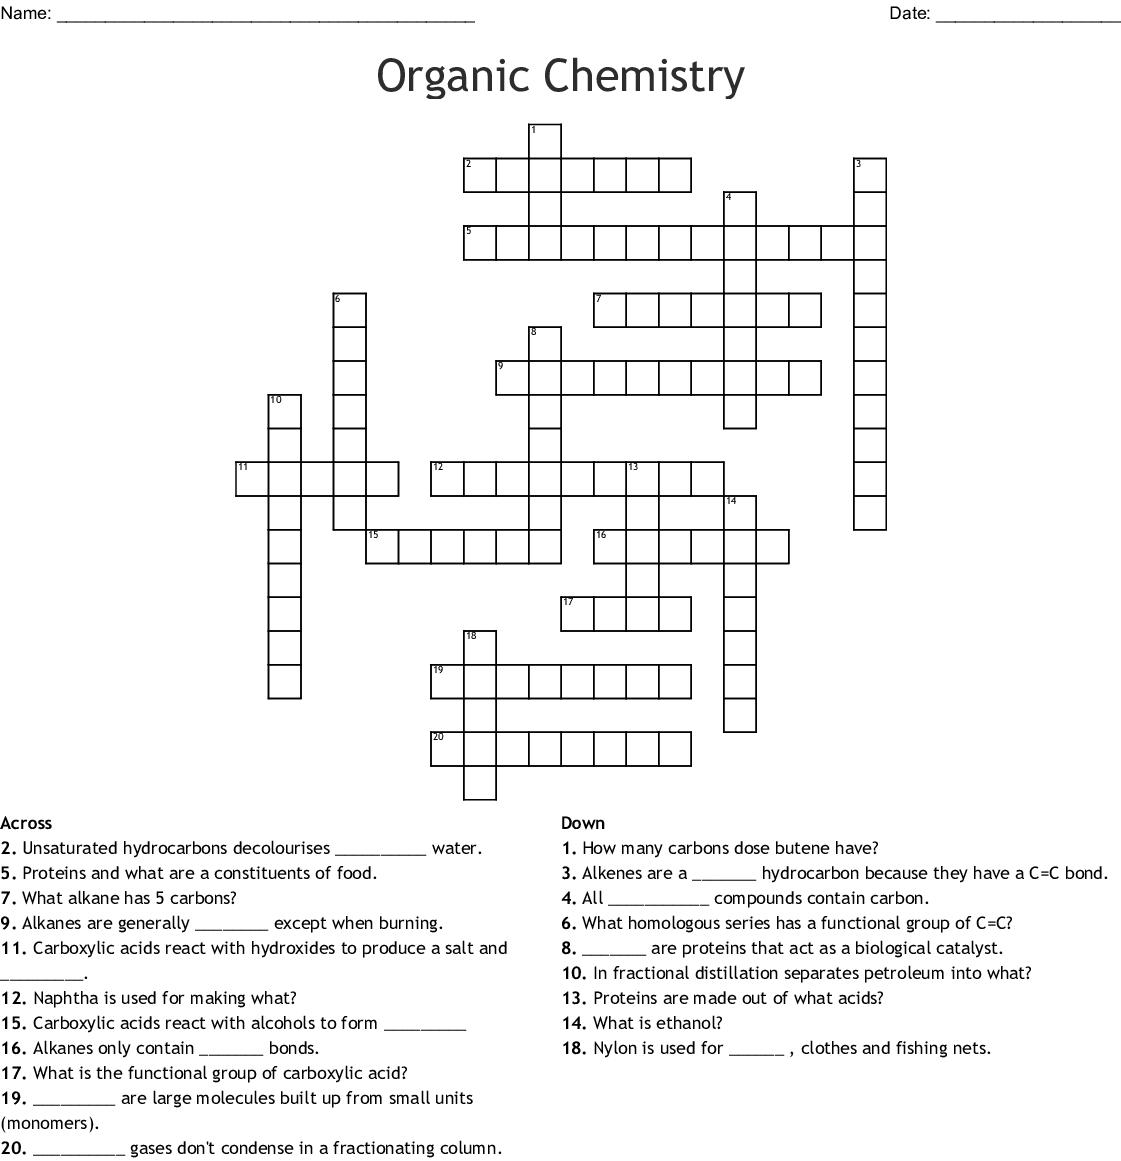 Organic Chemistry Crossword